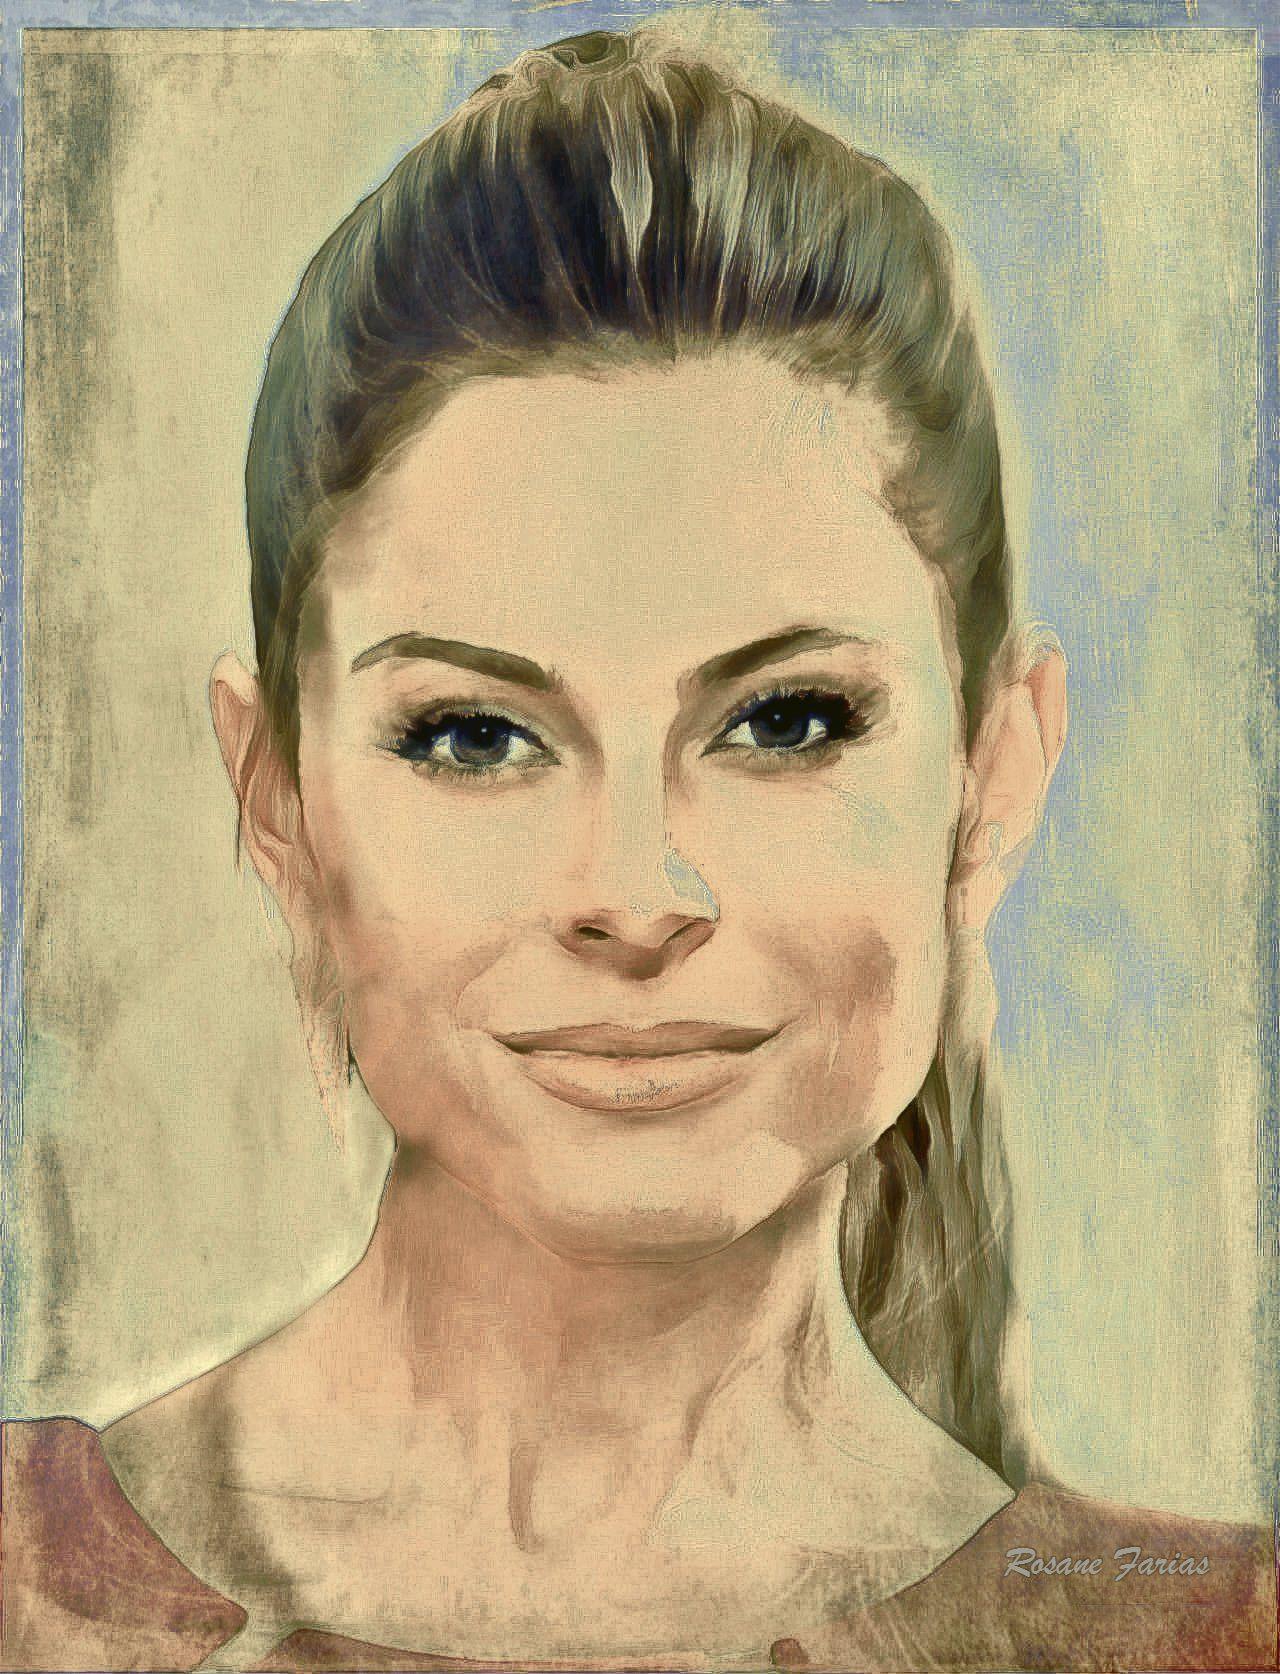 Maria Menounos Digital art - Free size